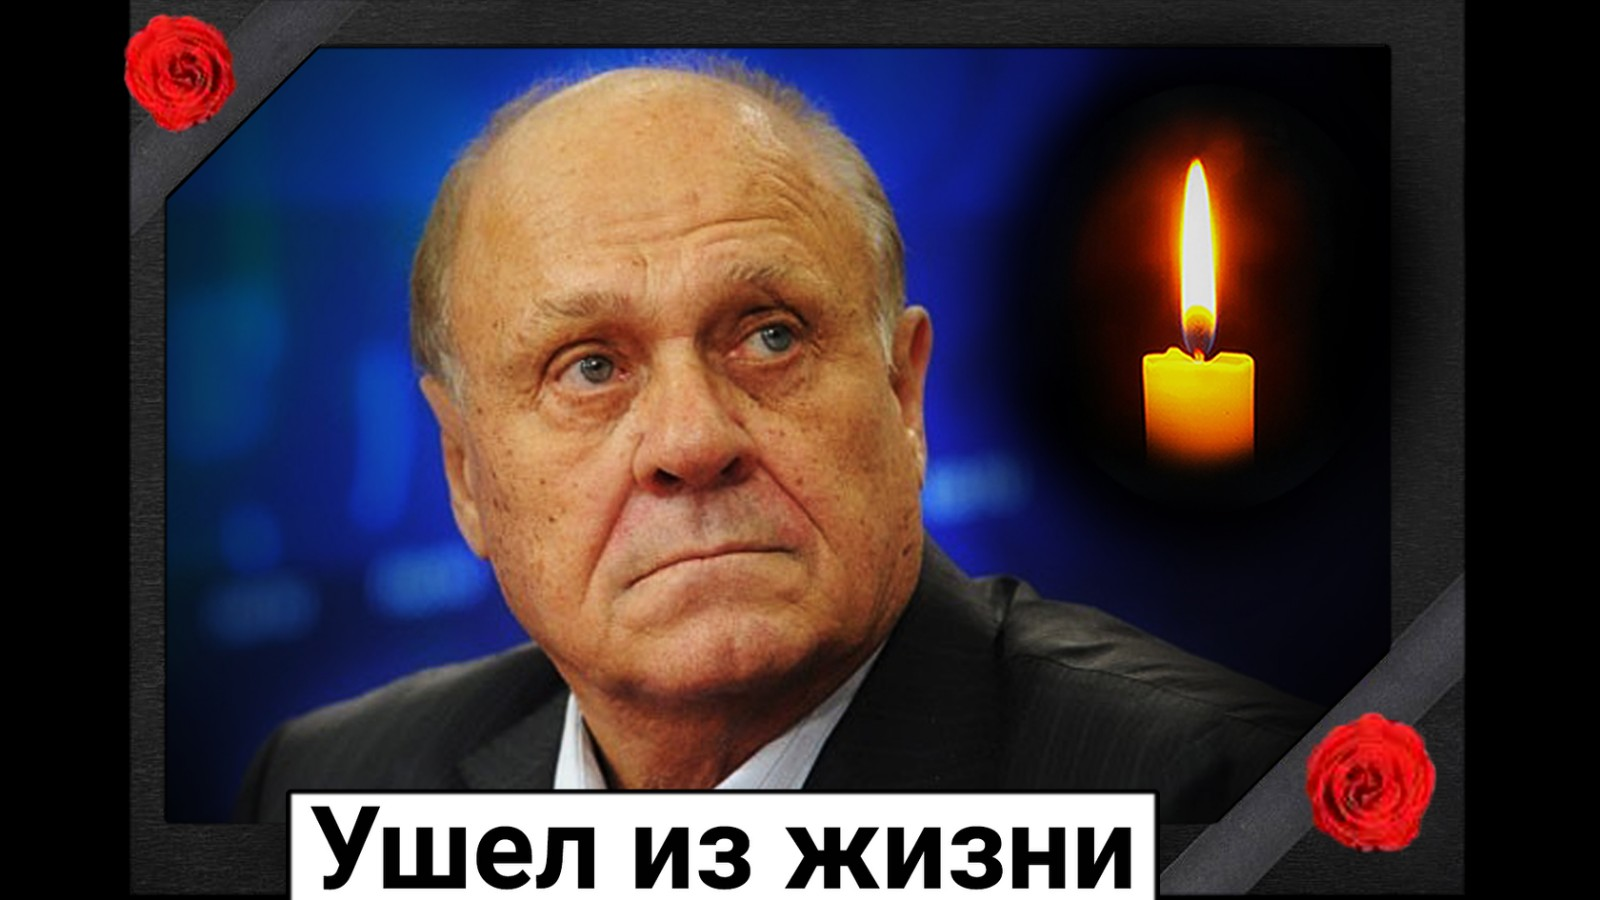 Read more about the article Ушел из жизни режиссер Владимир Меньшов